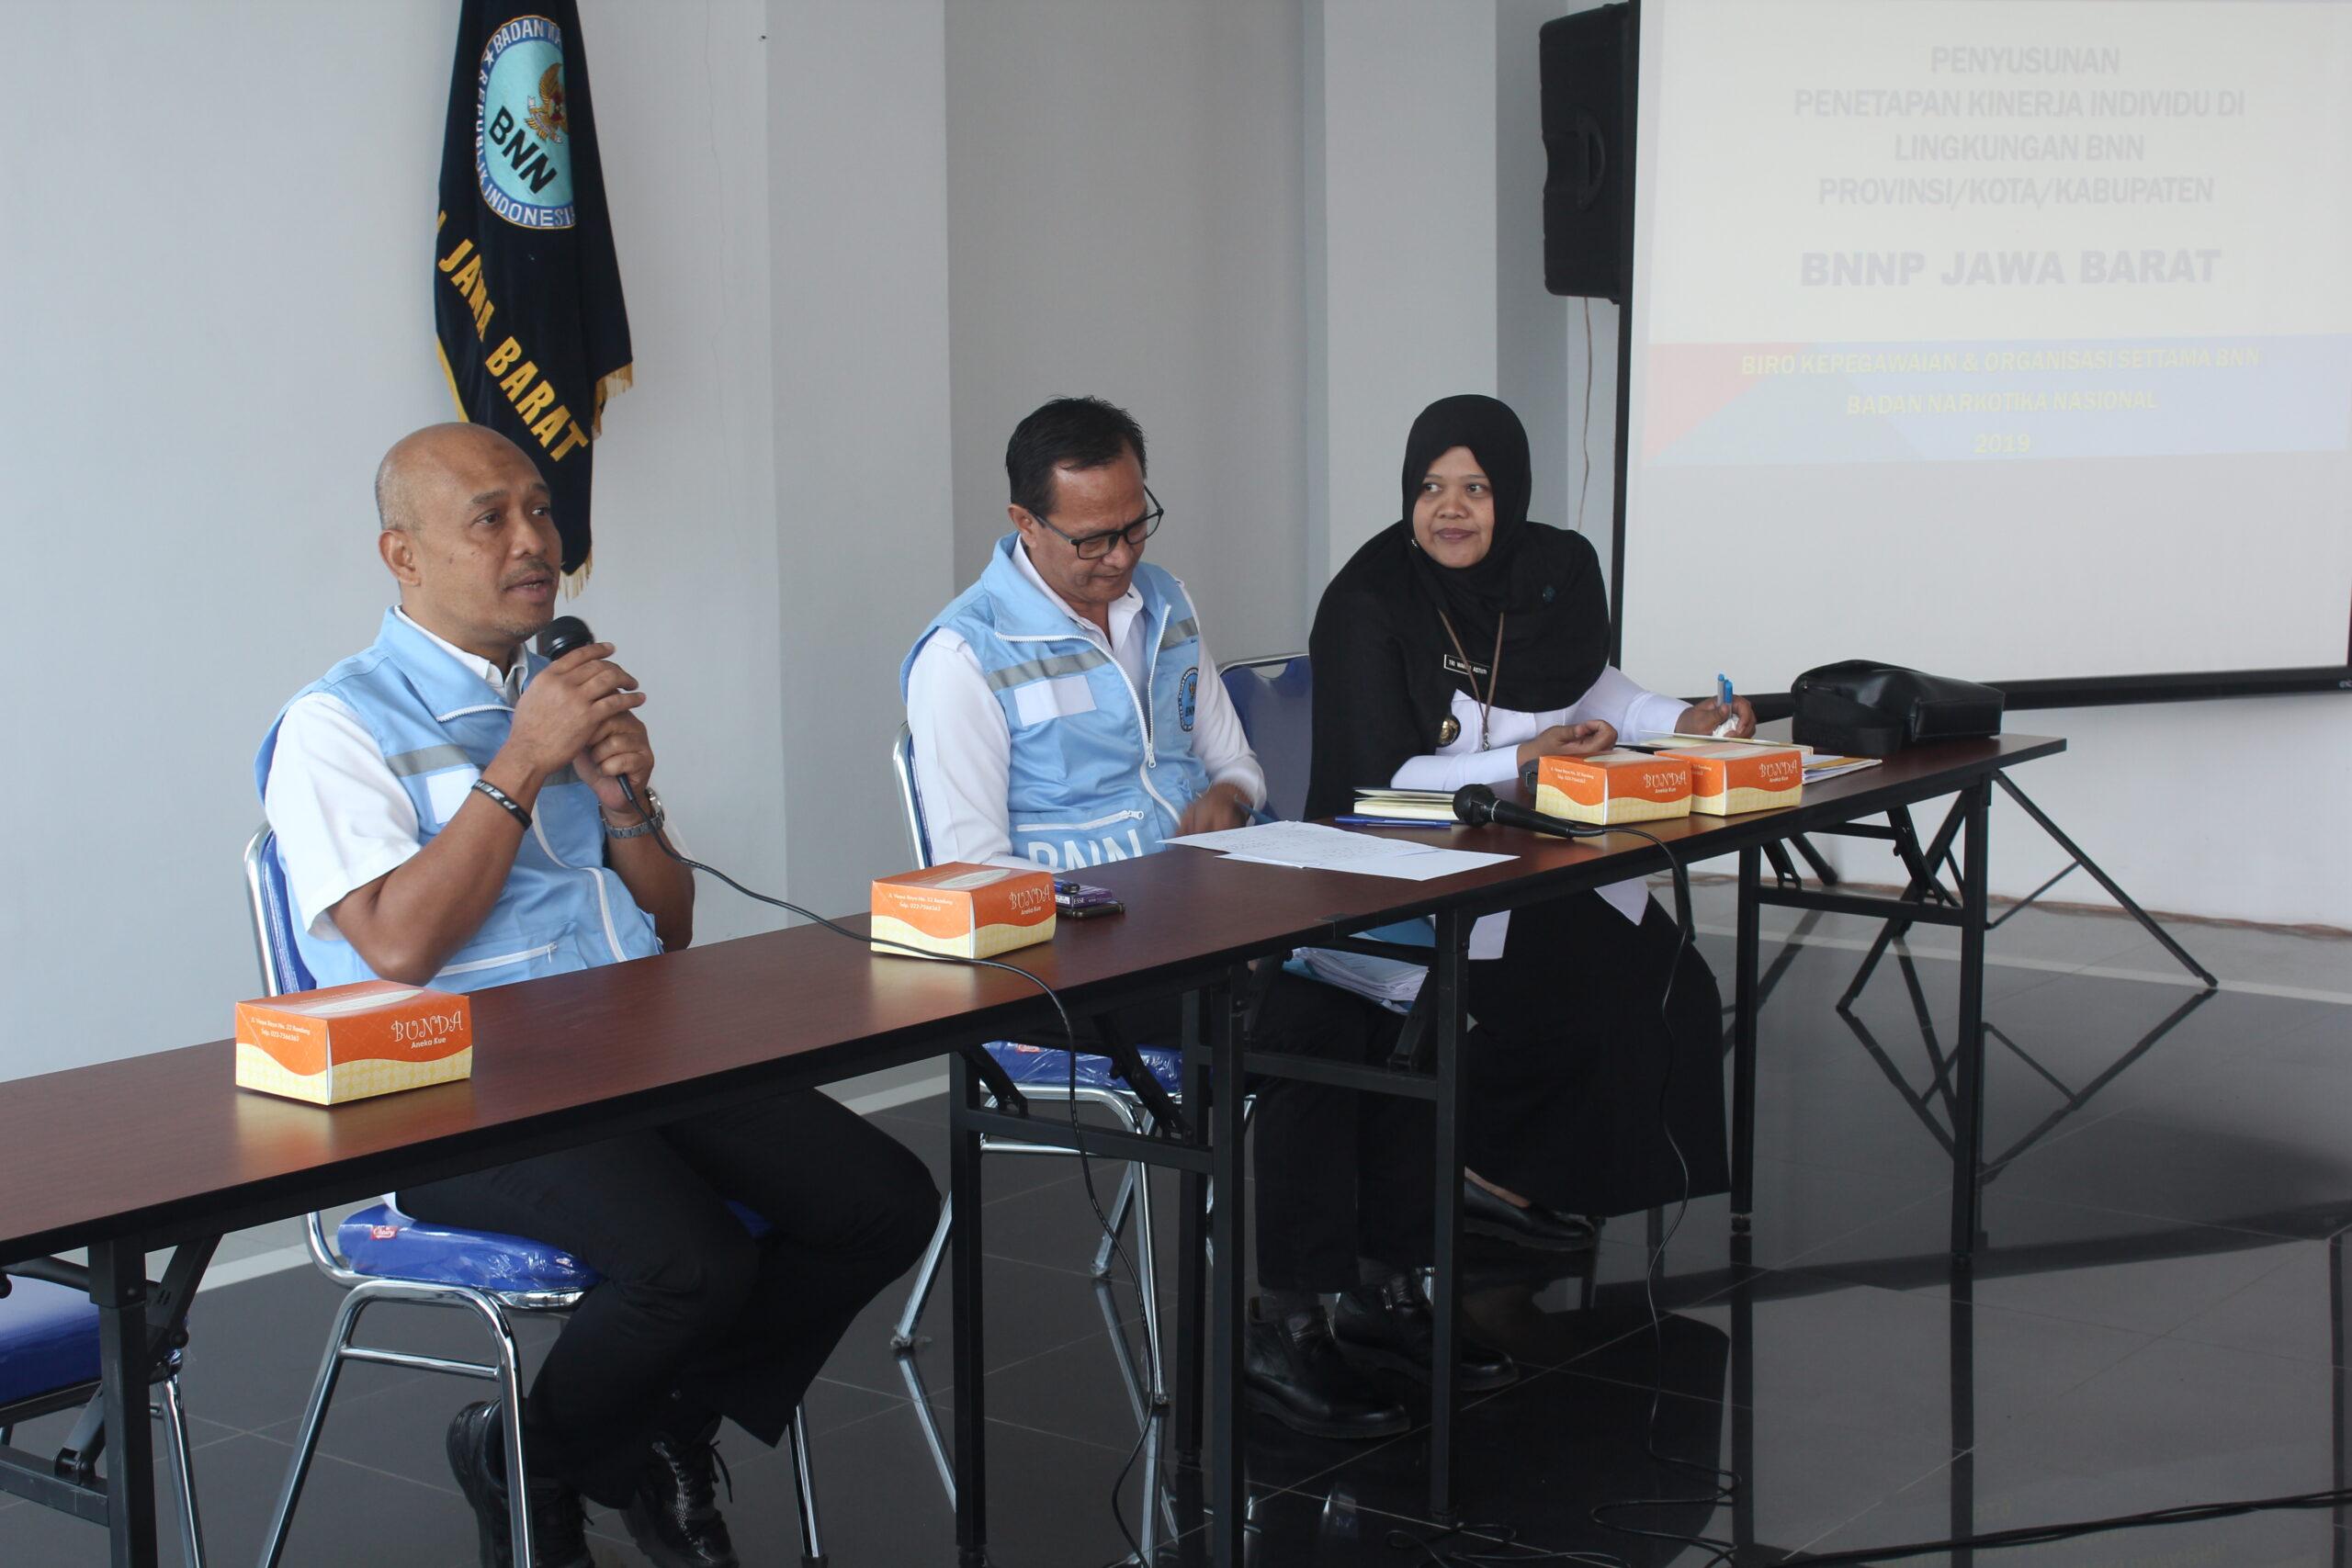 Sosialisasi Penyusunan Penetapan Kinerja Individu Di Lingkungan BNN Provinsi Jawa Barat dan BNN Kota/Kabupaten se Jawa Barat